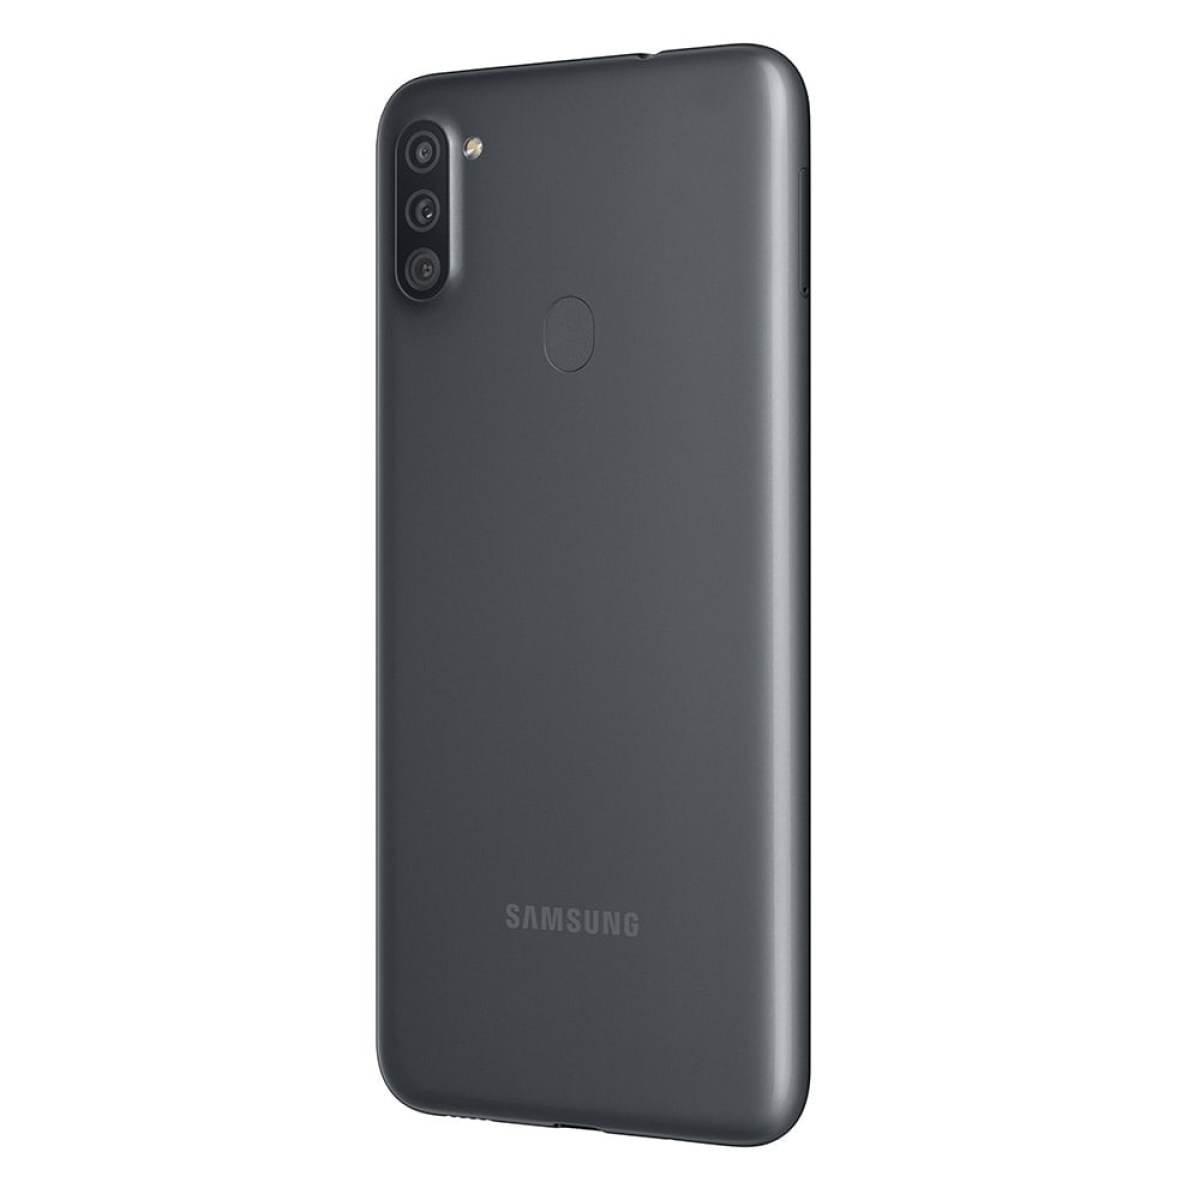 Smartphone Galaxy A11 Preto Tela 6.4 4G+WI-Fi Android 10 Câm Traseira 13+5+2MP e Frontal 8MP 64GB - Samsung